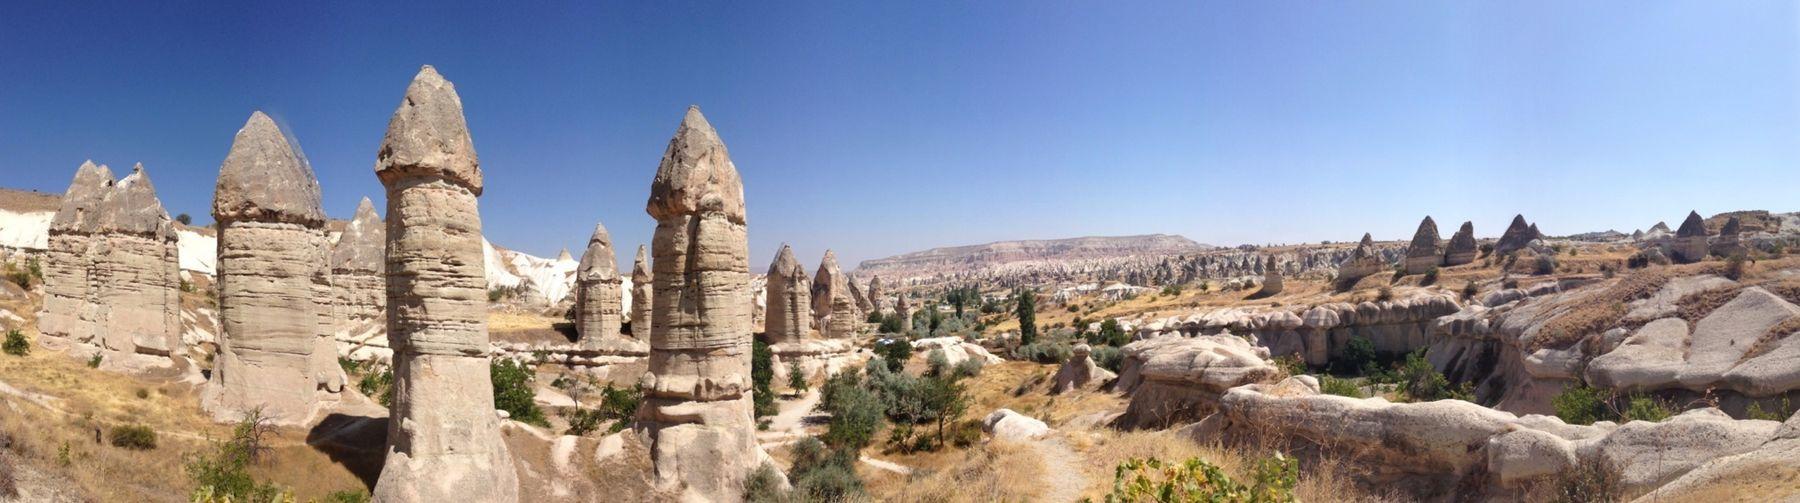 Zeme Valley /Love Valley Turkey Kapadokya Cappadocia Love